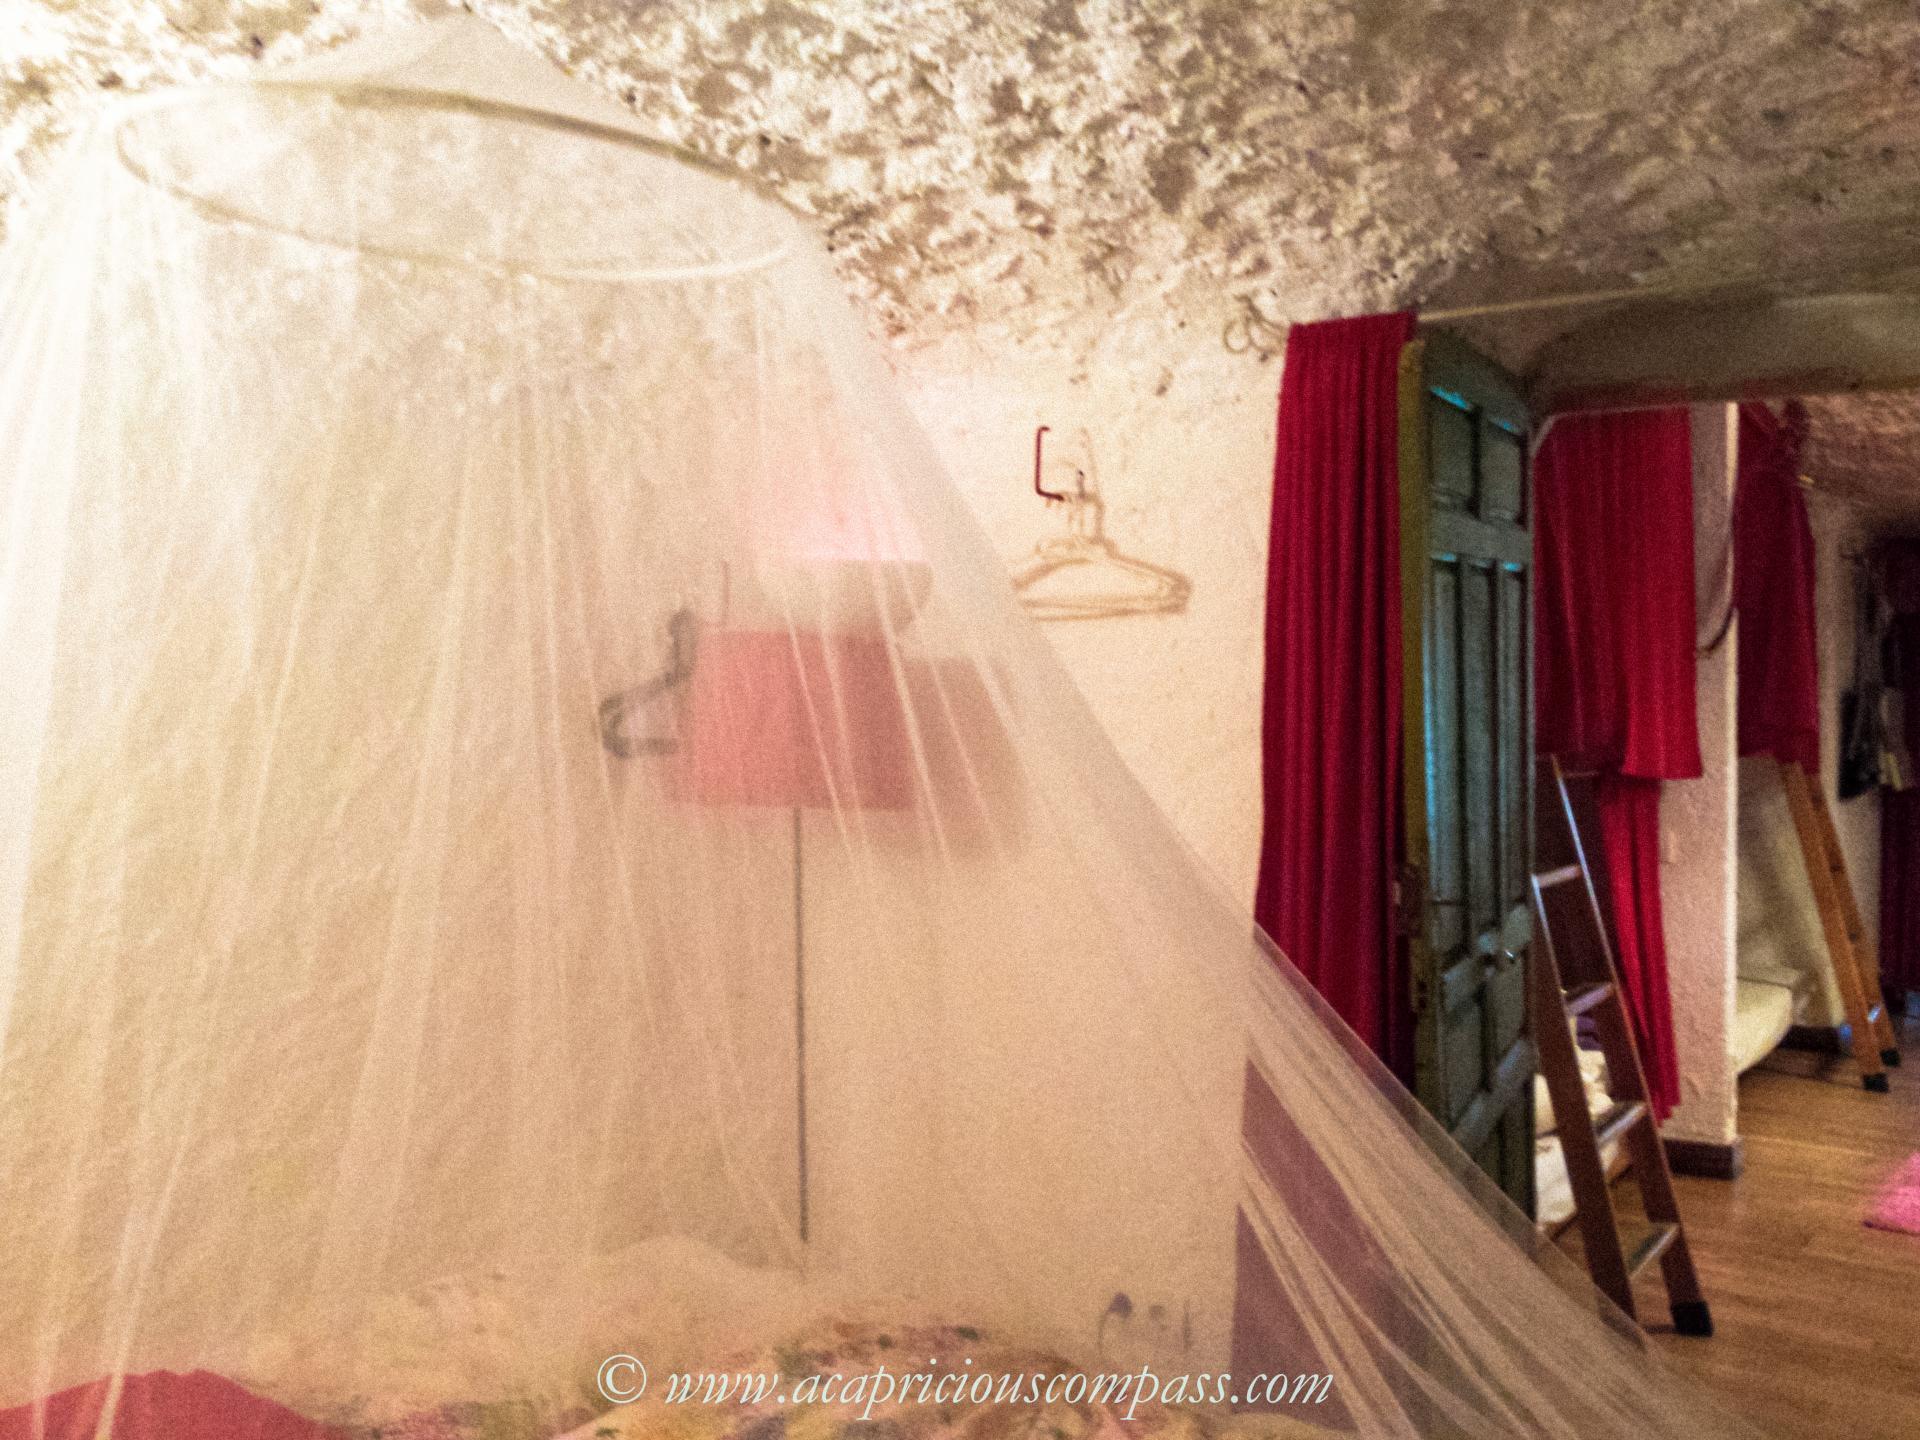 spain granada malaga bus information blog cave house travel